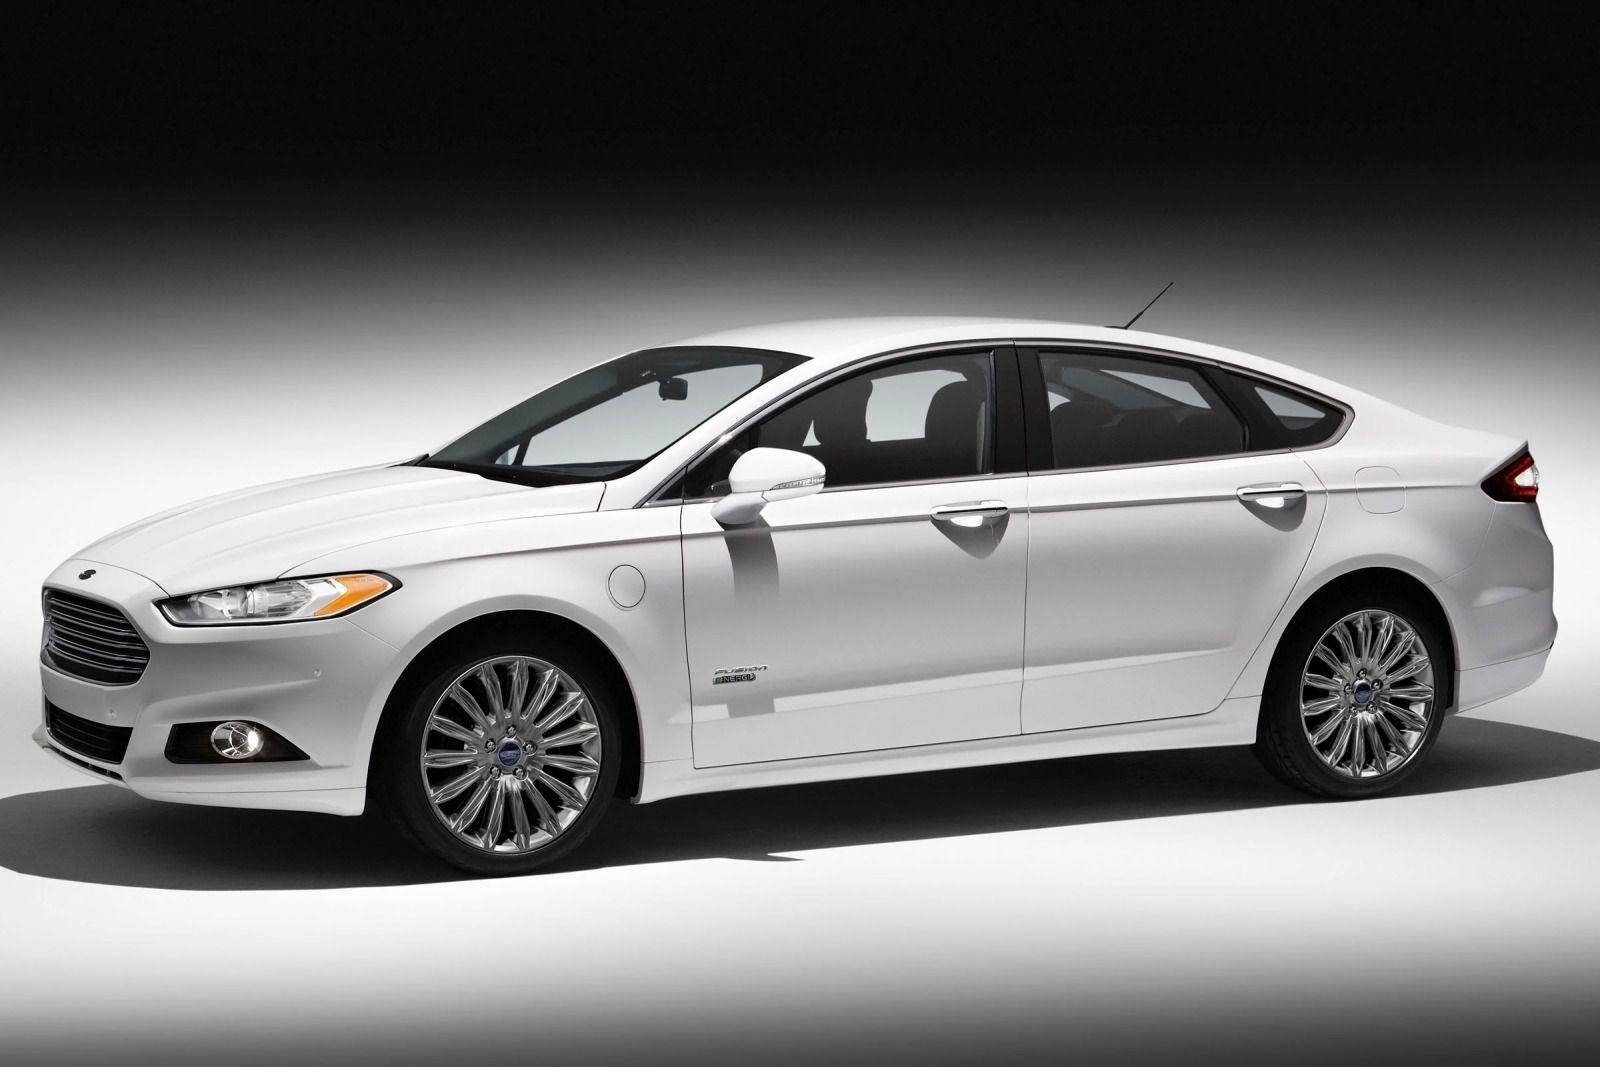 2016 Ford Fusion Hybrid Http Statewideford Com Van Wert Lima Fort Wayne For Sale New Makeid 12 Model Fusion Ford Fusion Ford Fusion Energi Hybrid Car